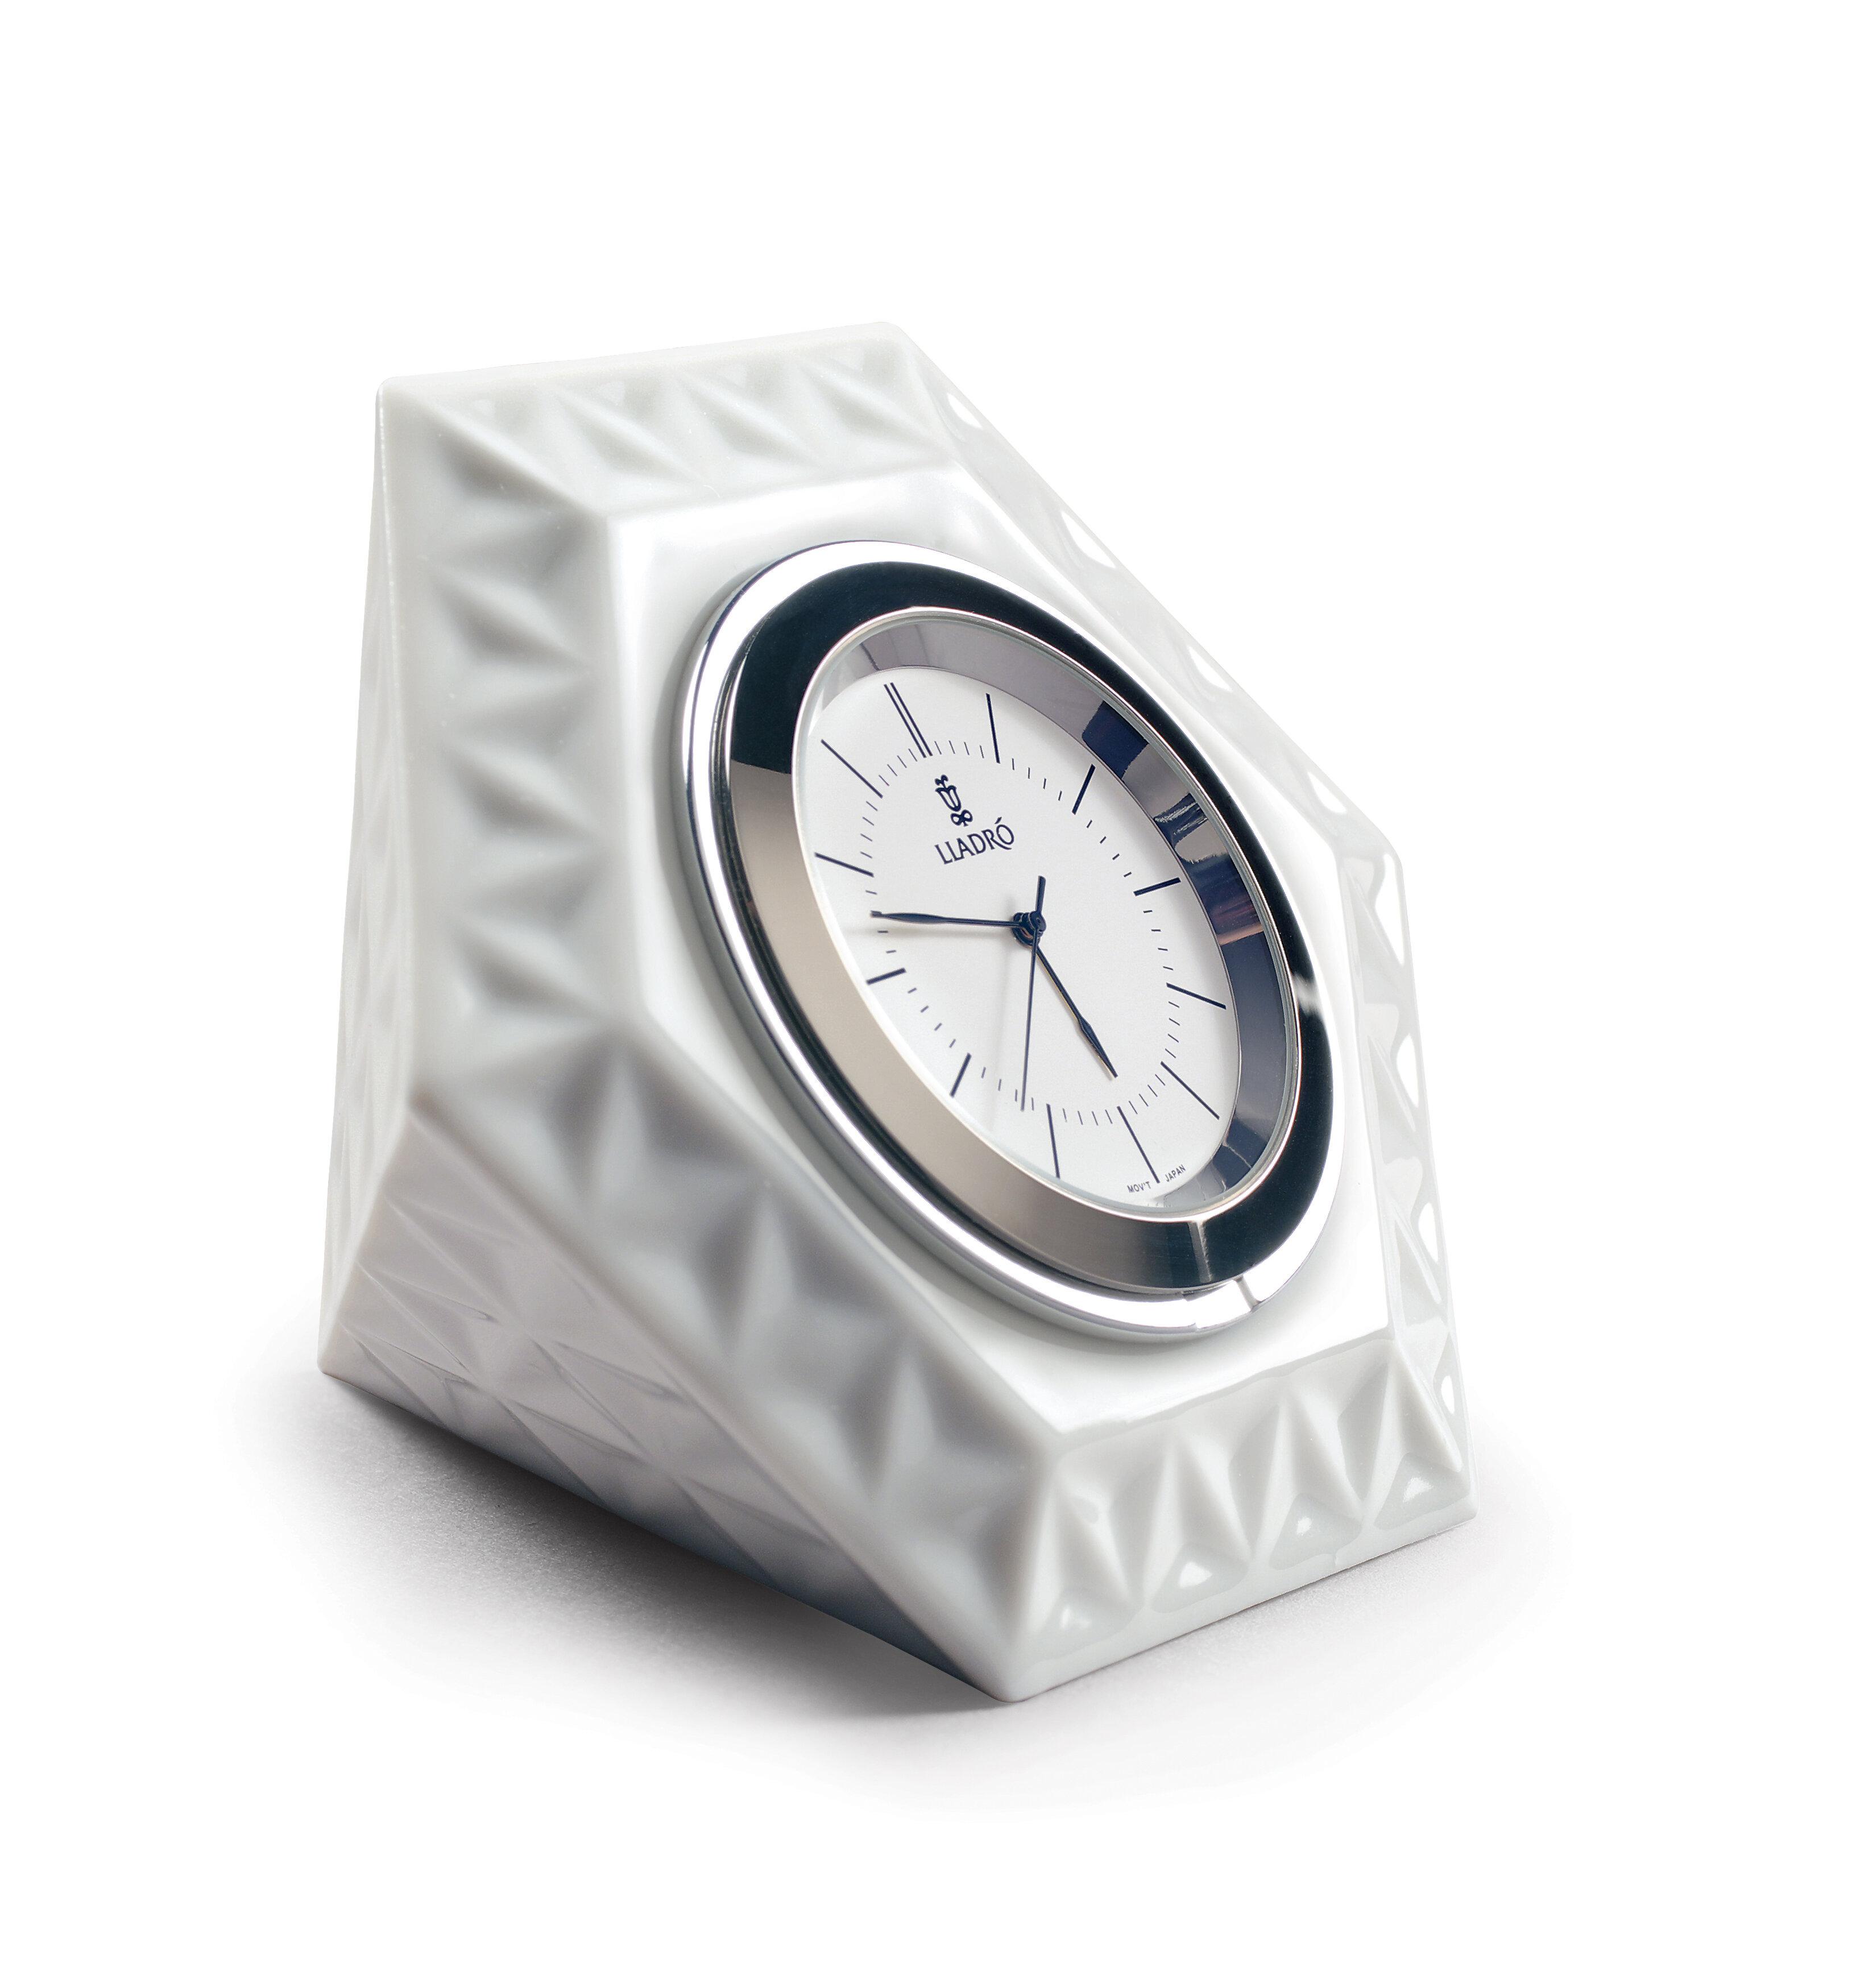 Lladro Hitoiki Analog Porcelain Mechanical Tabletop Clock In White Perigold